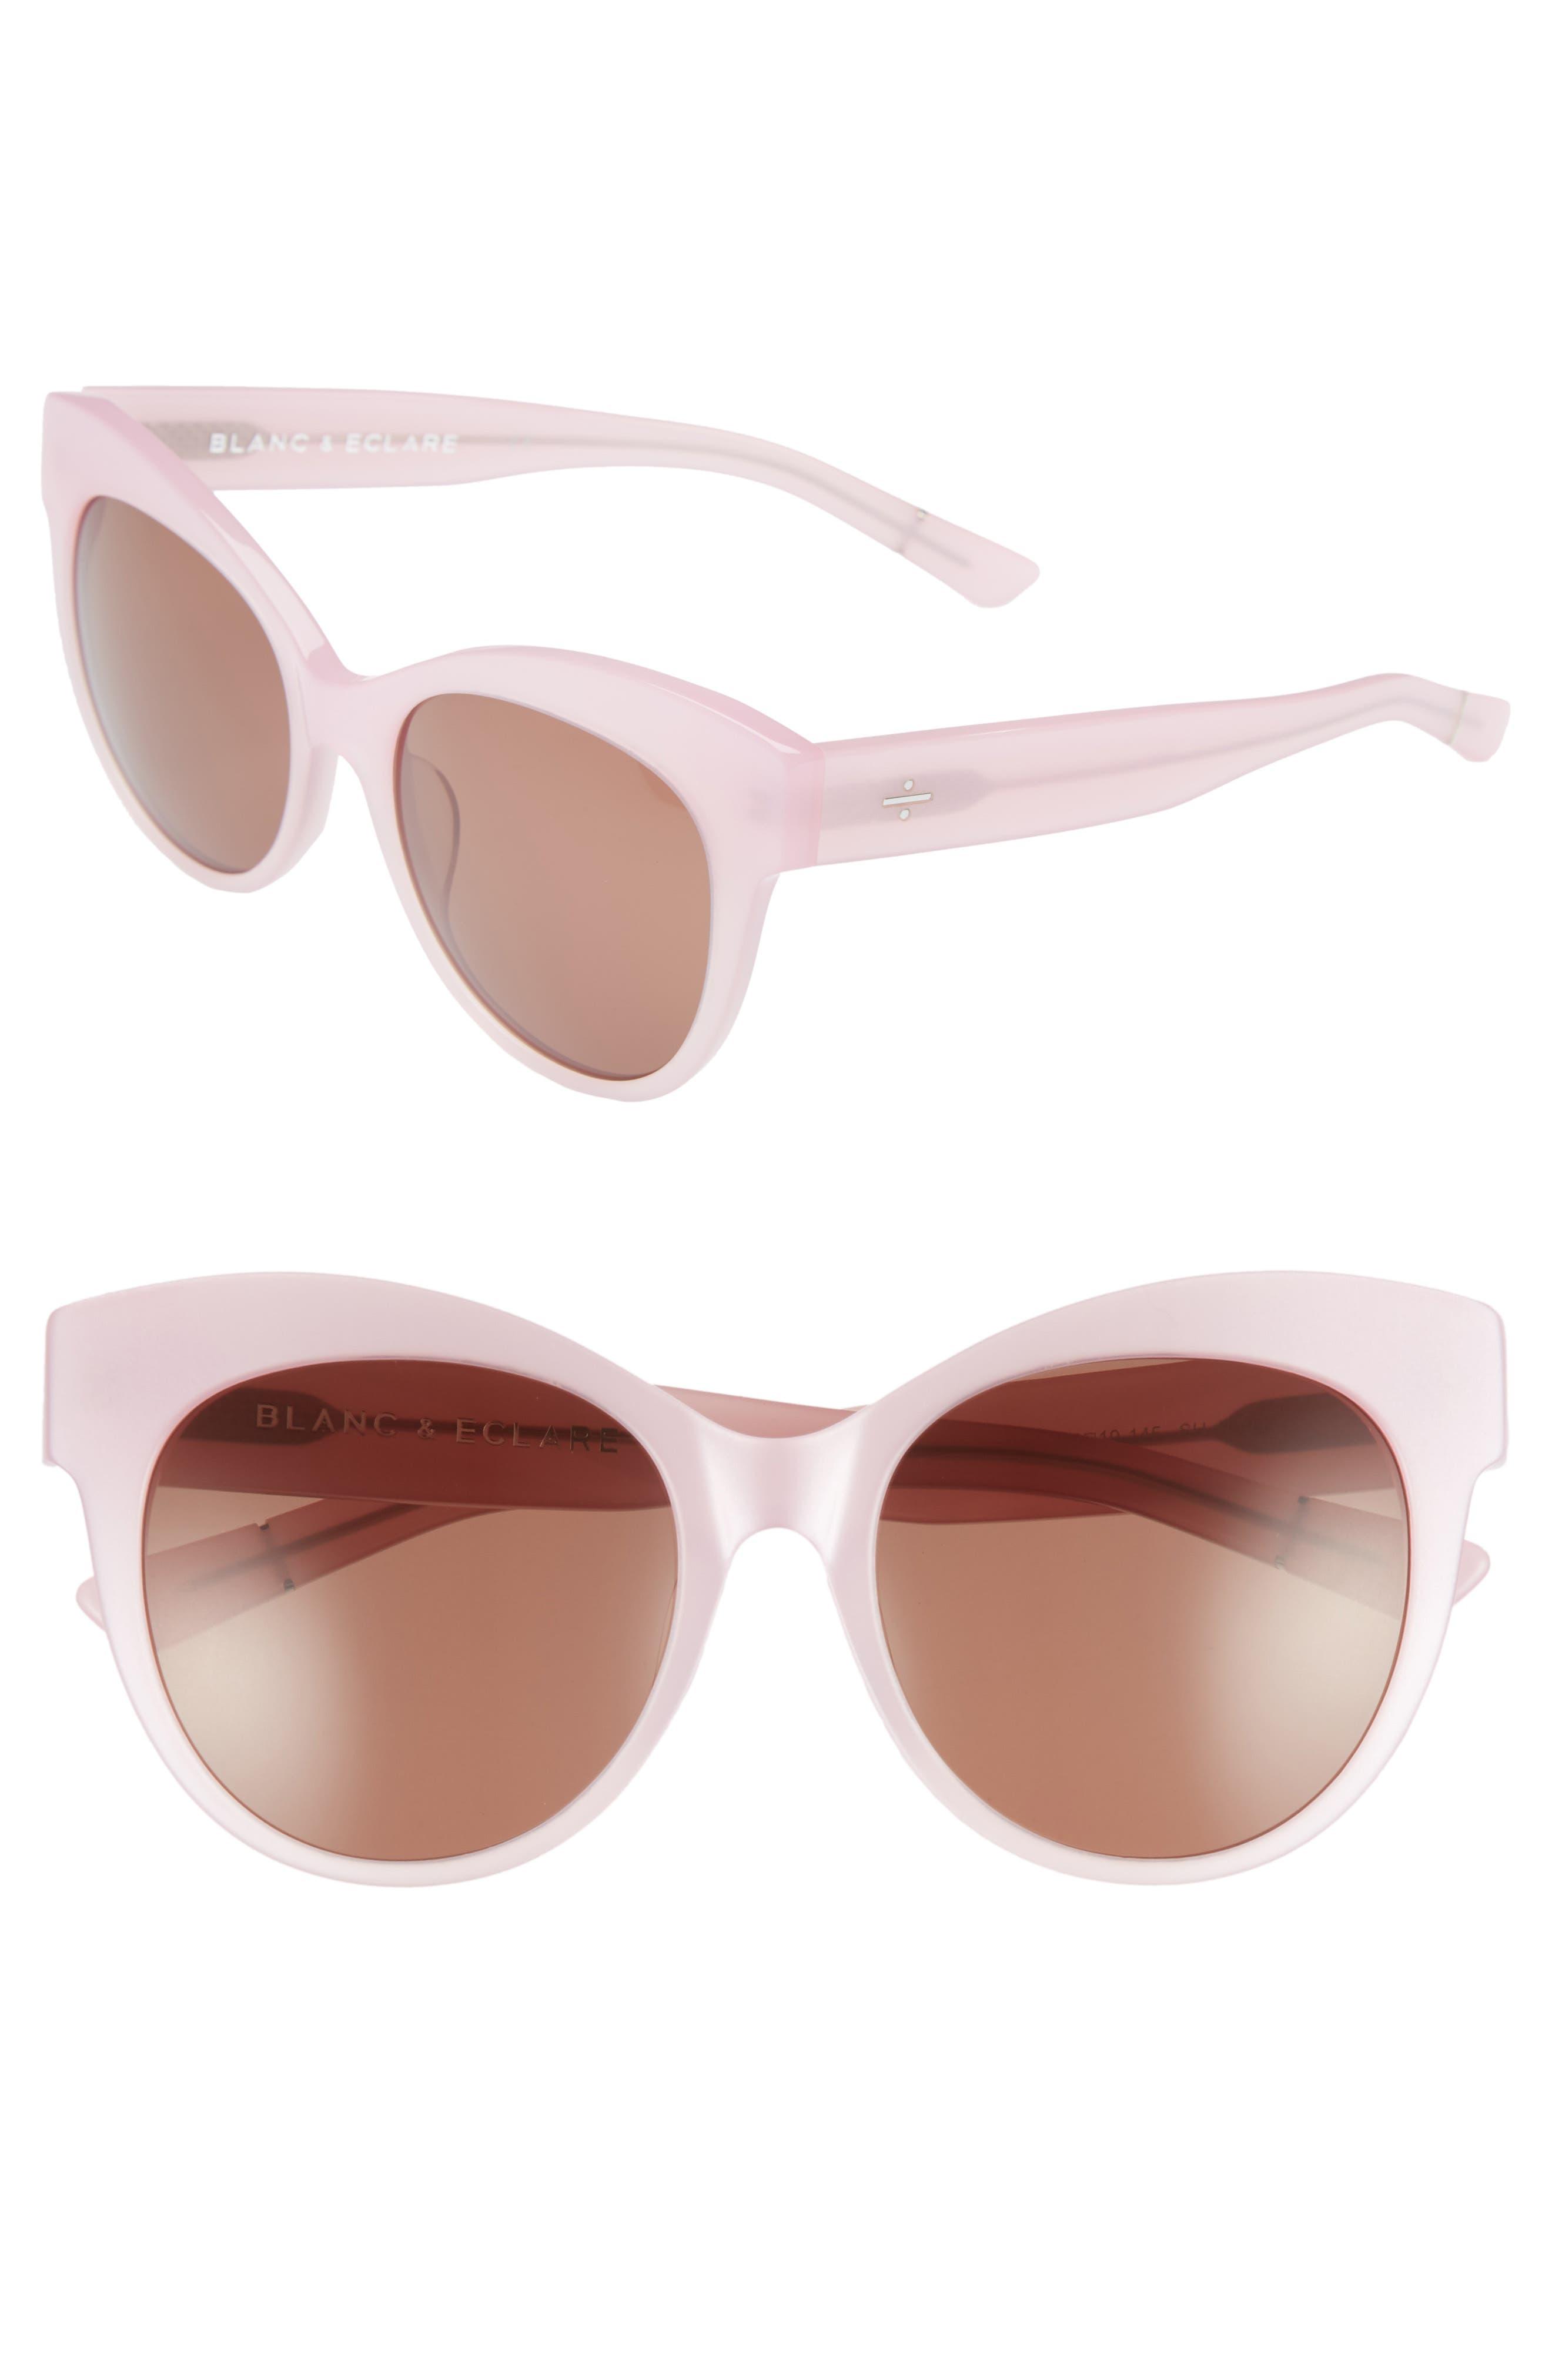 BLANC & ECLARE Paris 55mm Polarized Cat Eye Sunglasses,                         Main,                         color, Blush